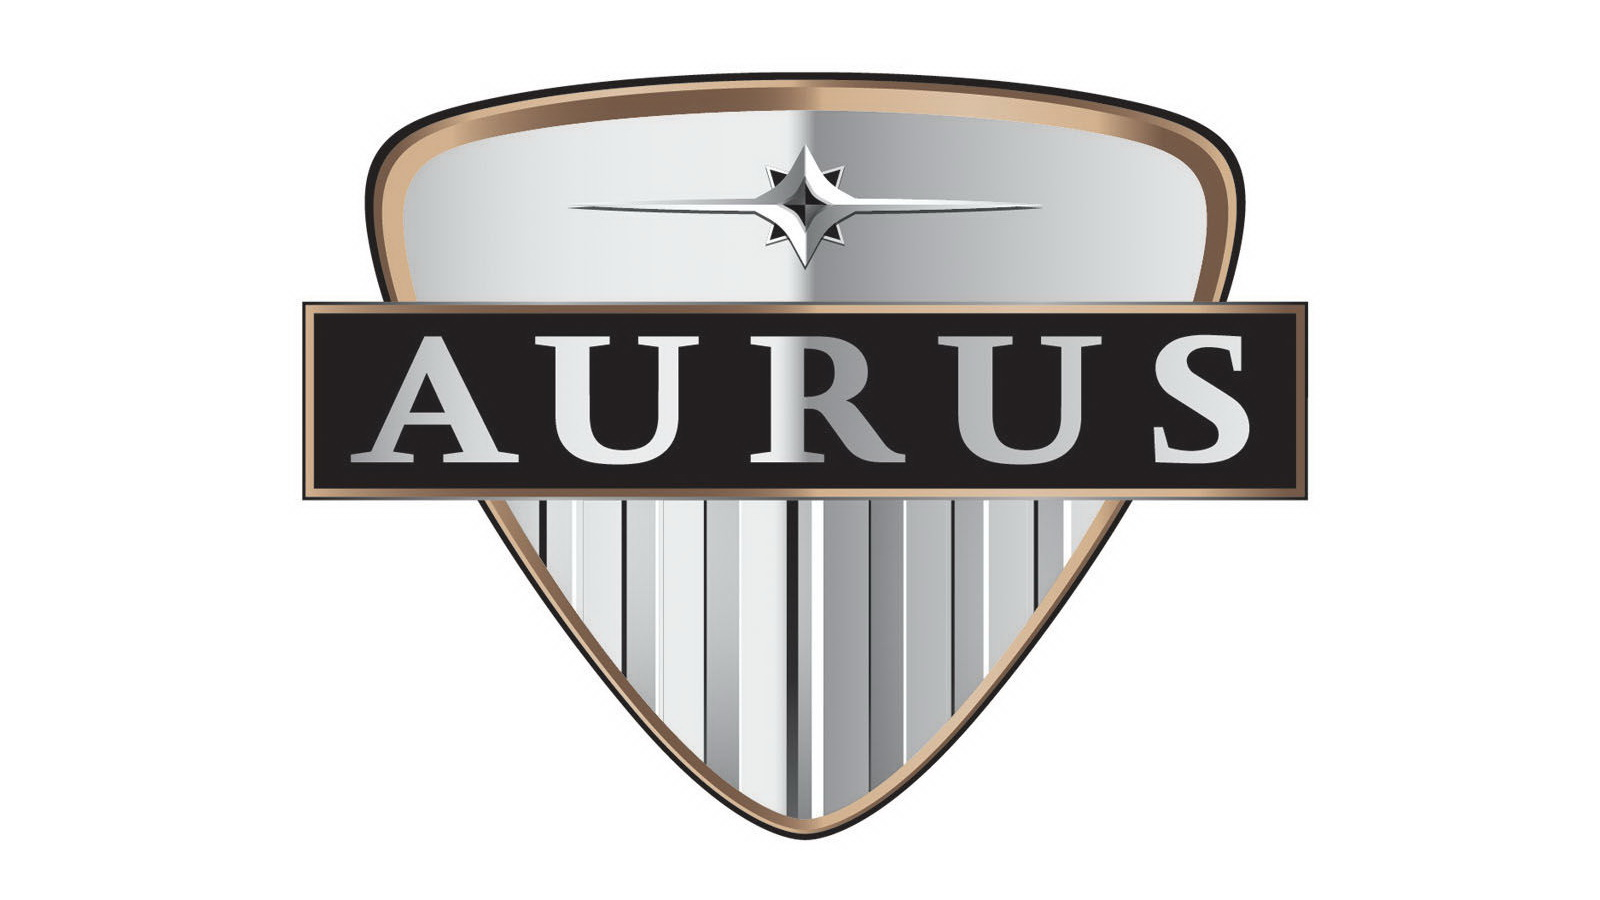 (video) Noul brand auto rusesc AURUS, prezentat oficial. Director e un fost top manager al Daimler